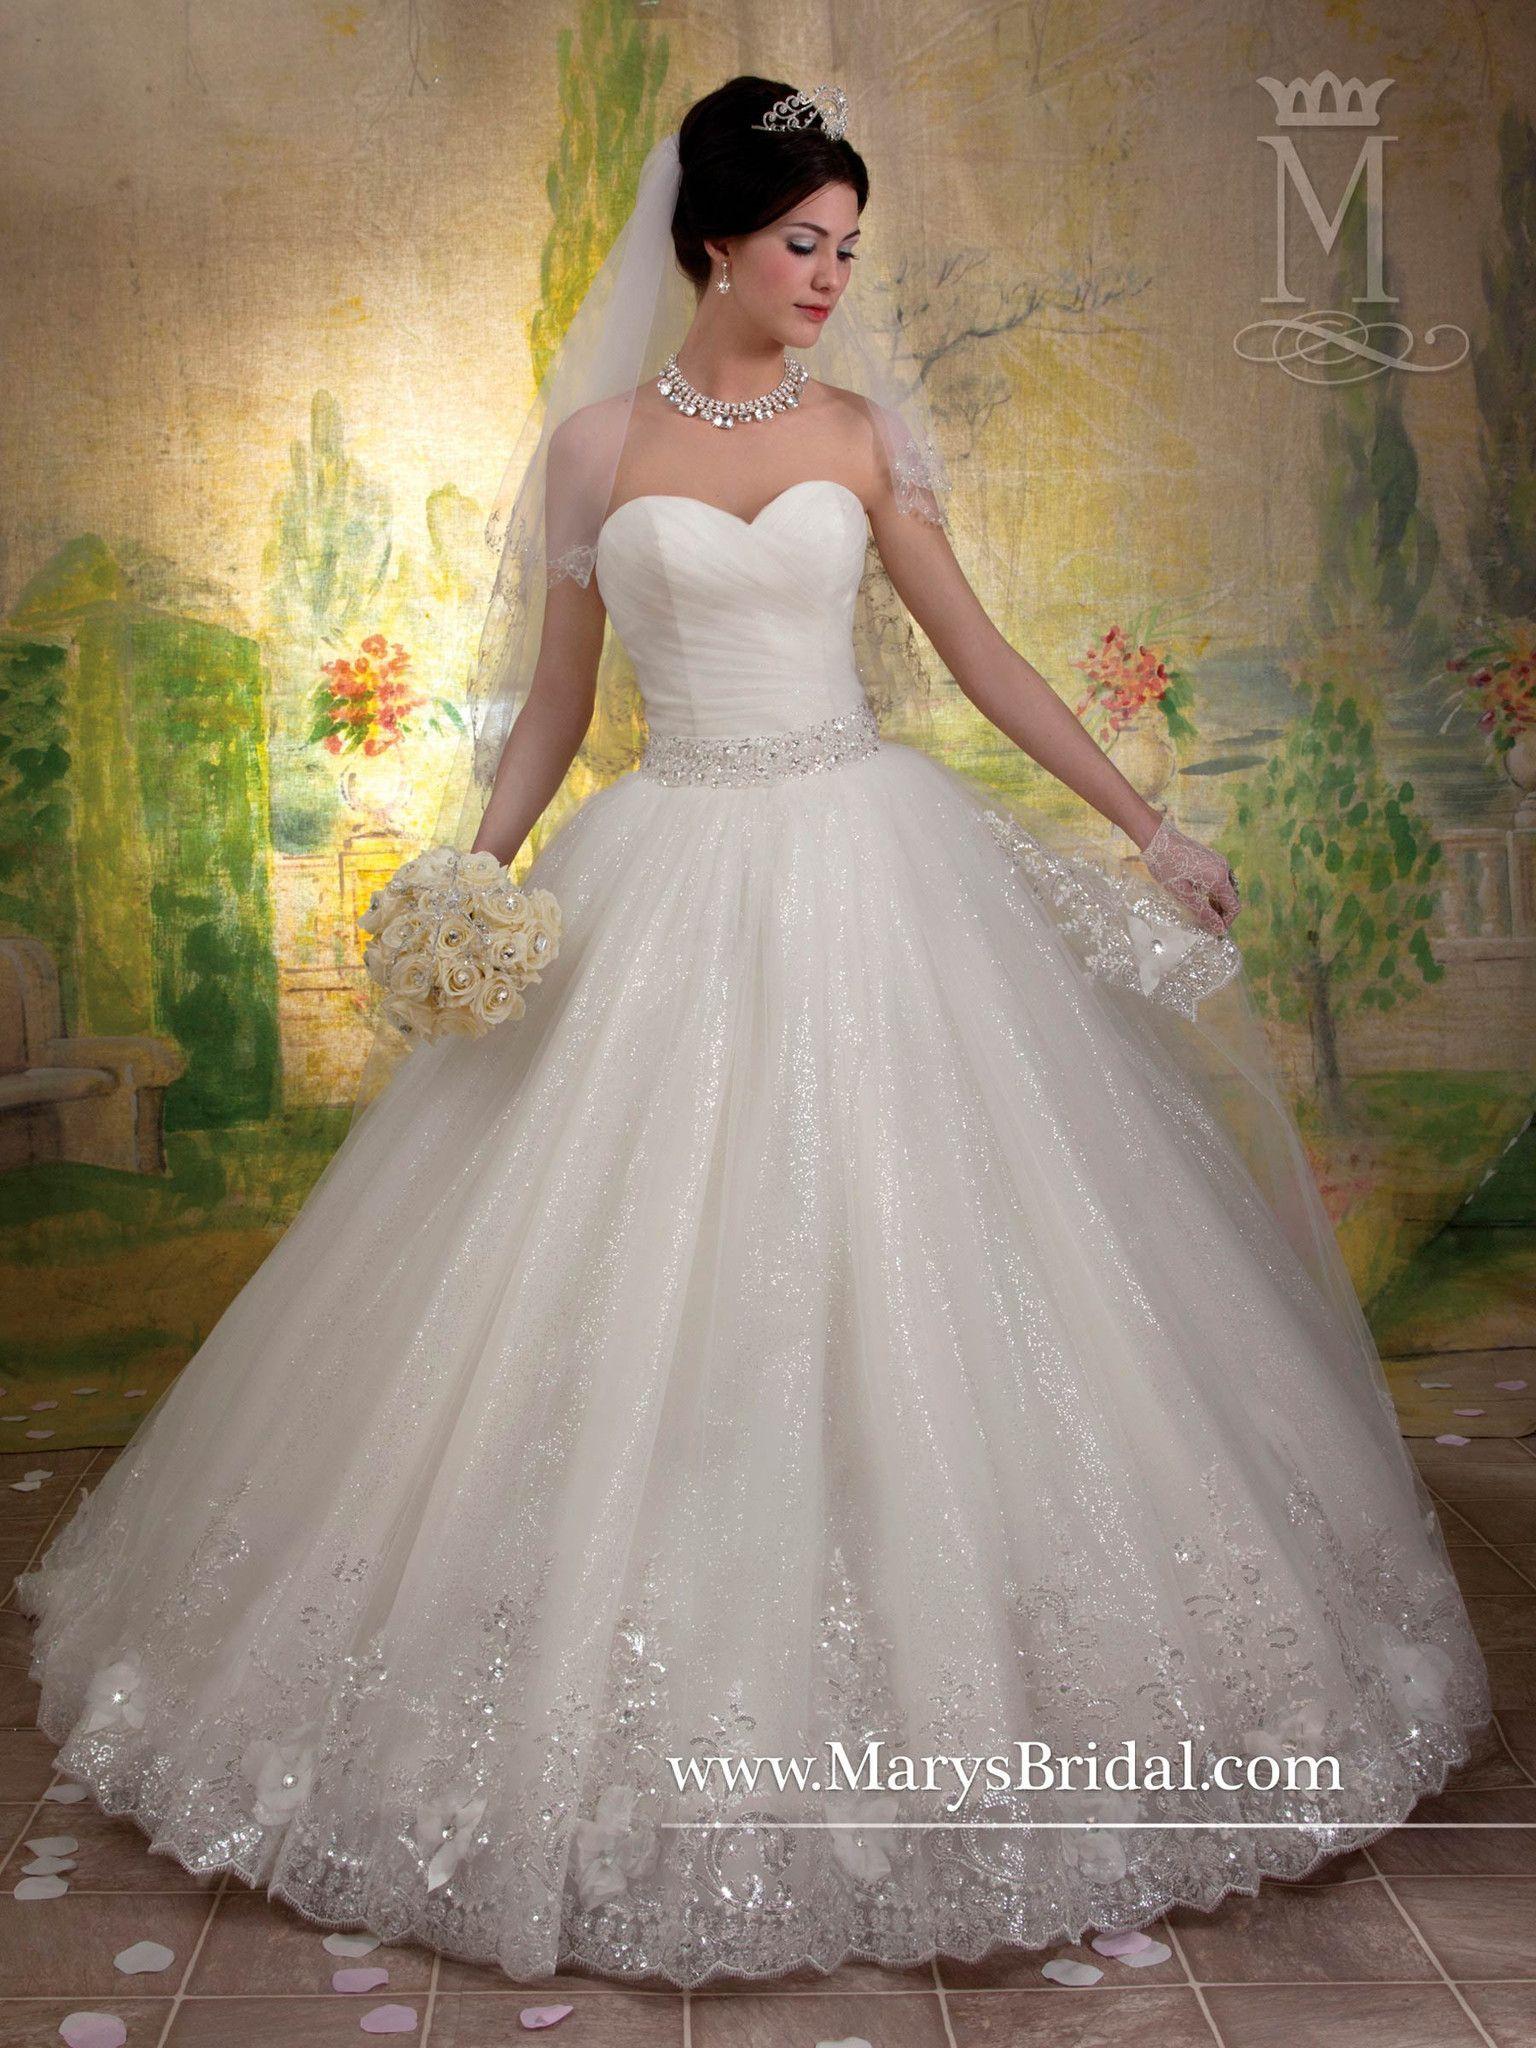 Sparkling Tulle Sweetheart Ball Gown | Weddings! | Pinterest | Ball ...